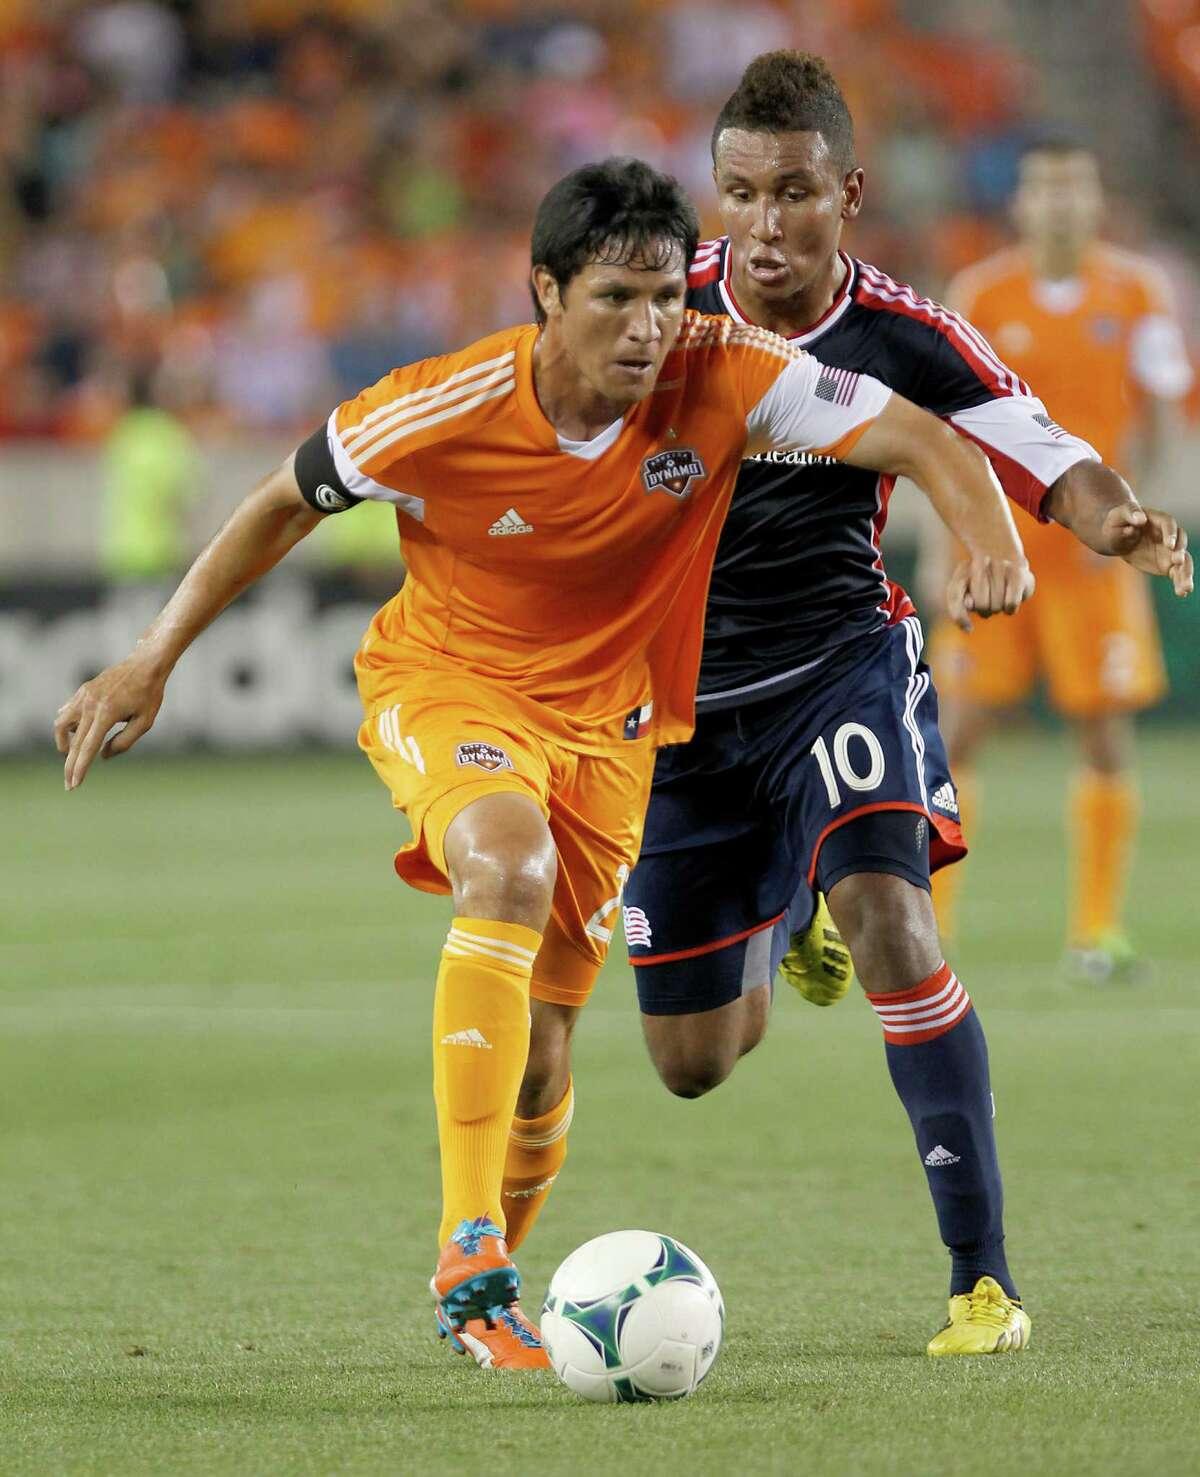 5/18/13: Houston Dynamo forward Brian Ching (25) dribbles against New England Revolution Juan Agudelo (10) in the second half at BBVA Compass Stadium in Houston, Texas. New England Revolution won 2 to 0.